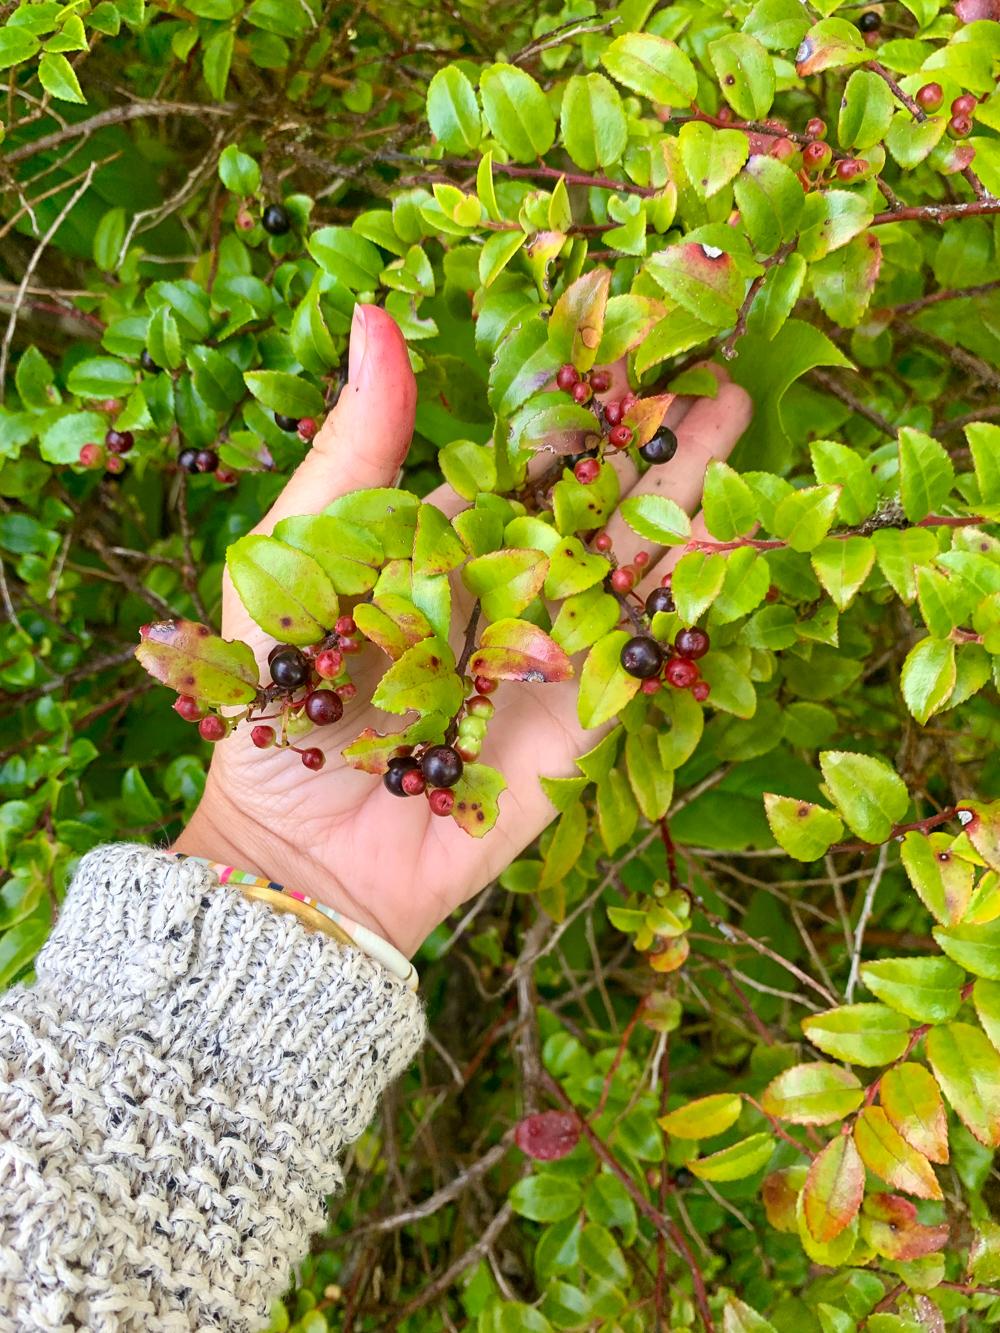 Picking huckleberries